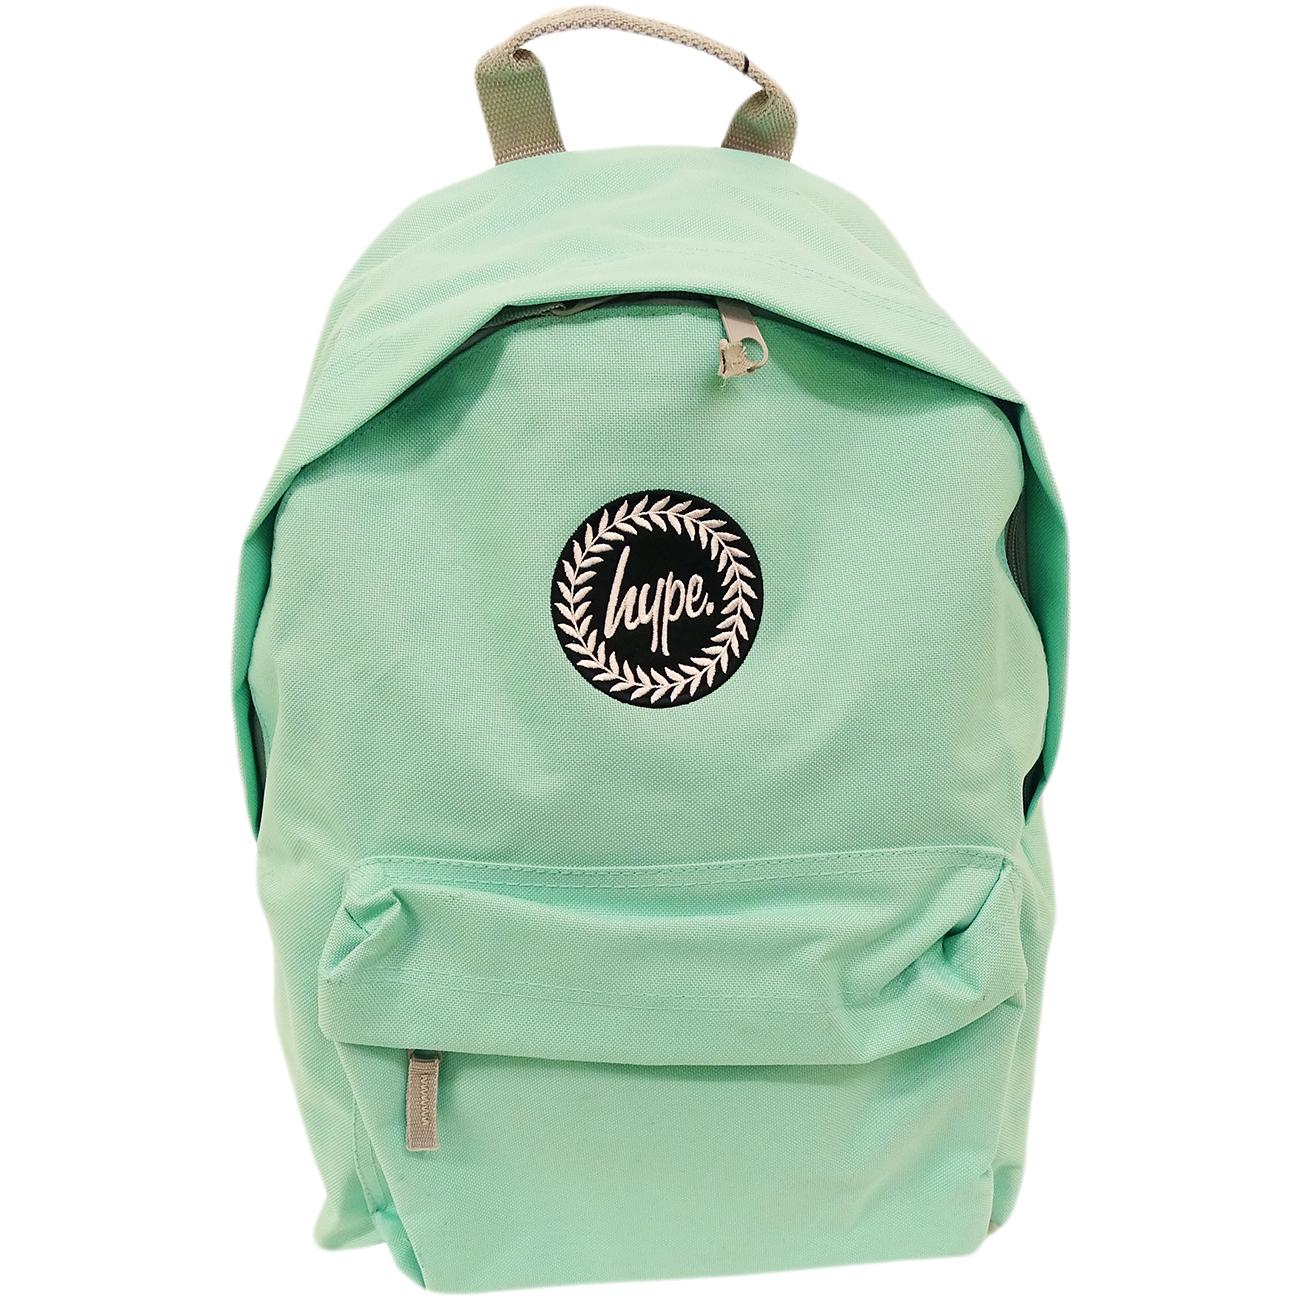 Hype Backpack Plain Mint Bag